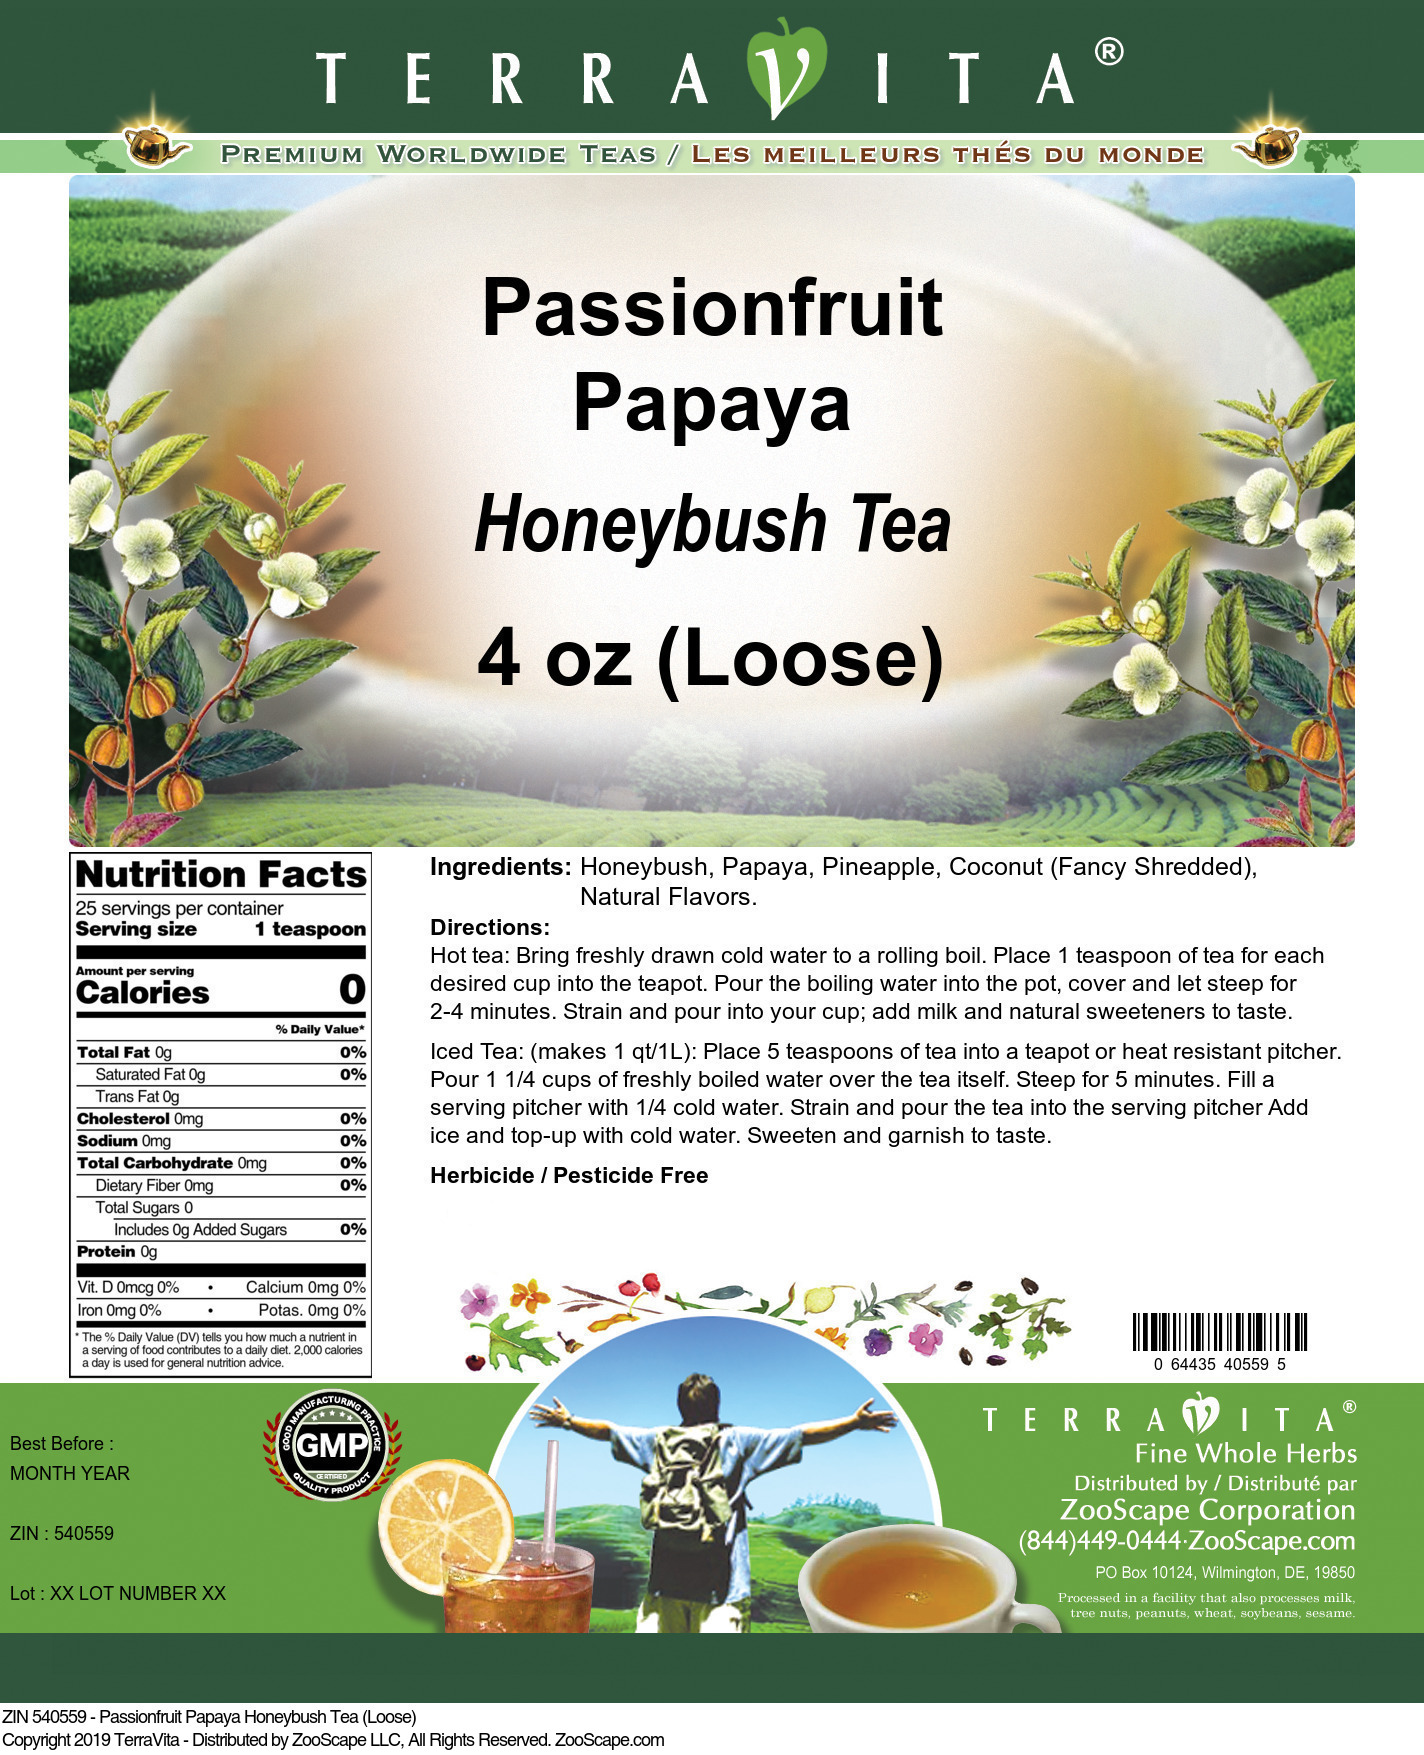 Passionfruit Papaya Honeybush Tea (Loose)